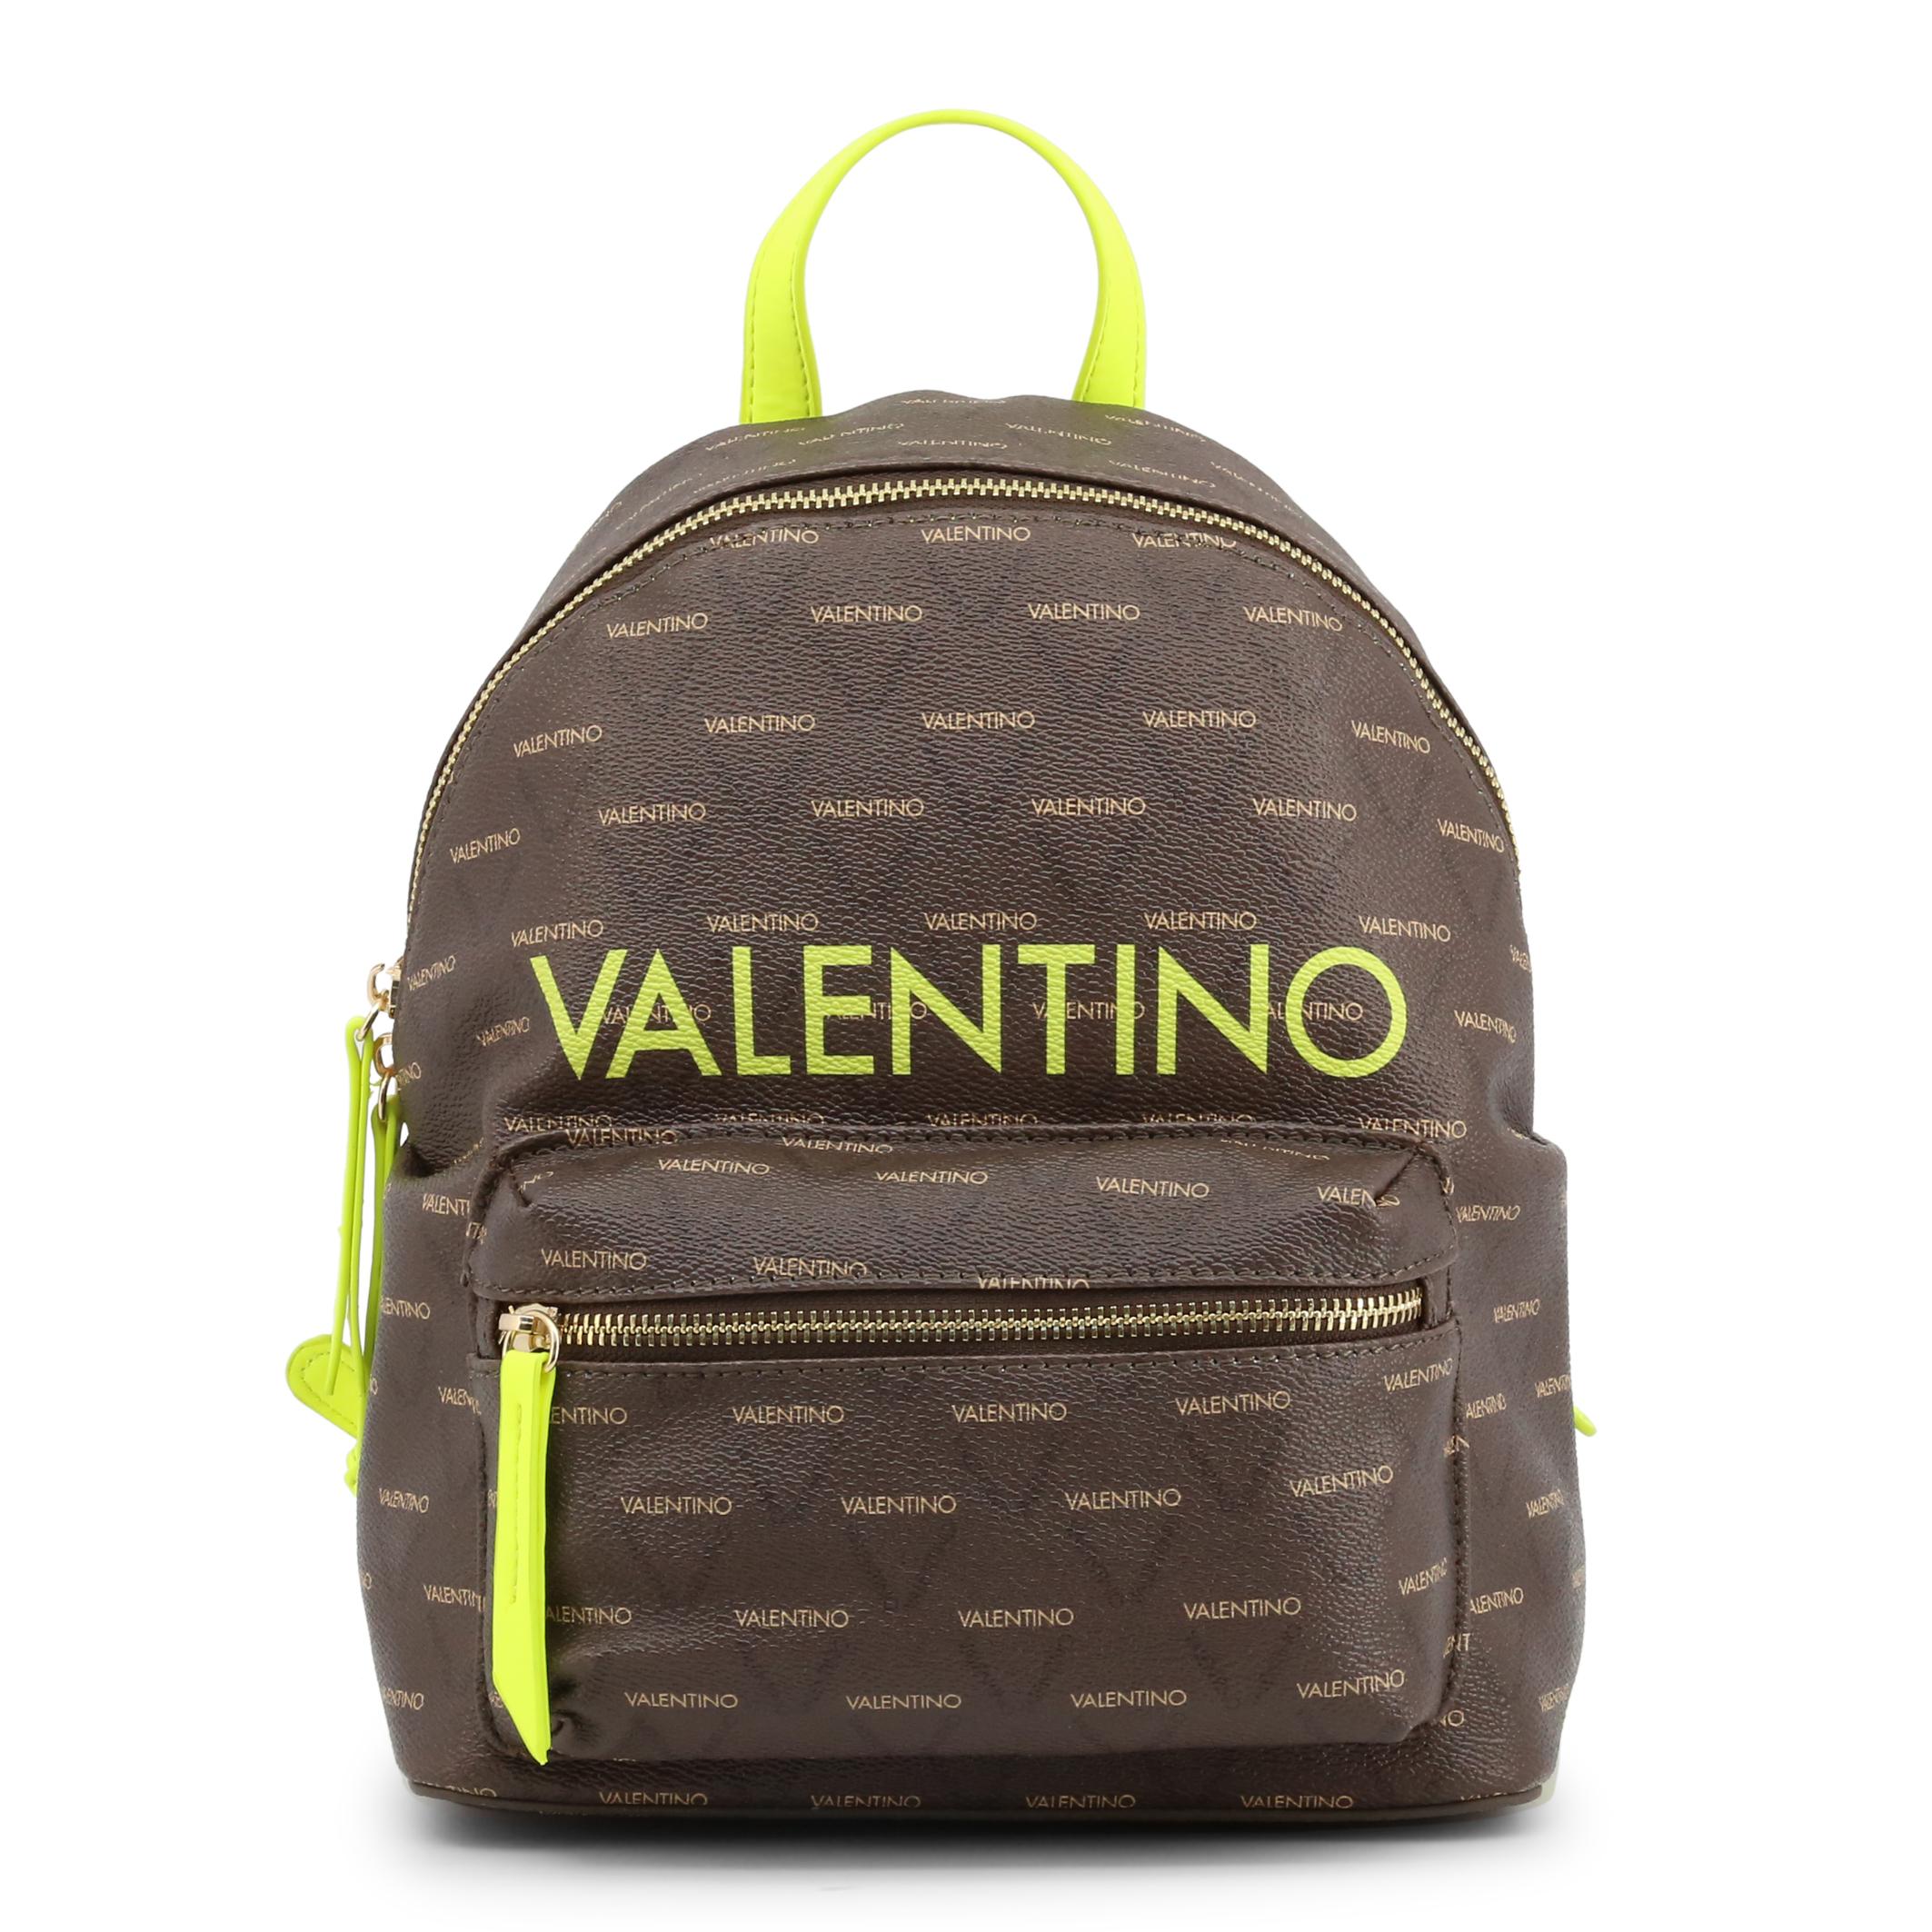 Femme Valentino by Mario Valentino – LIUTO FLUO-VBS46810